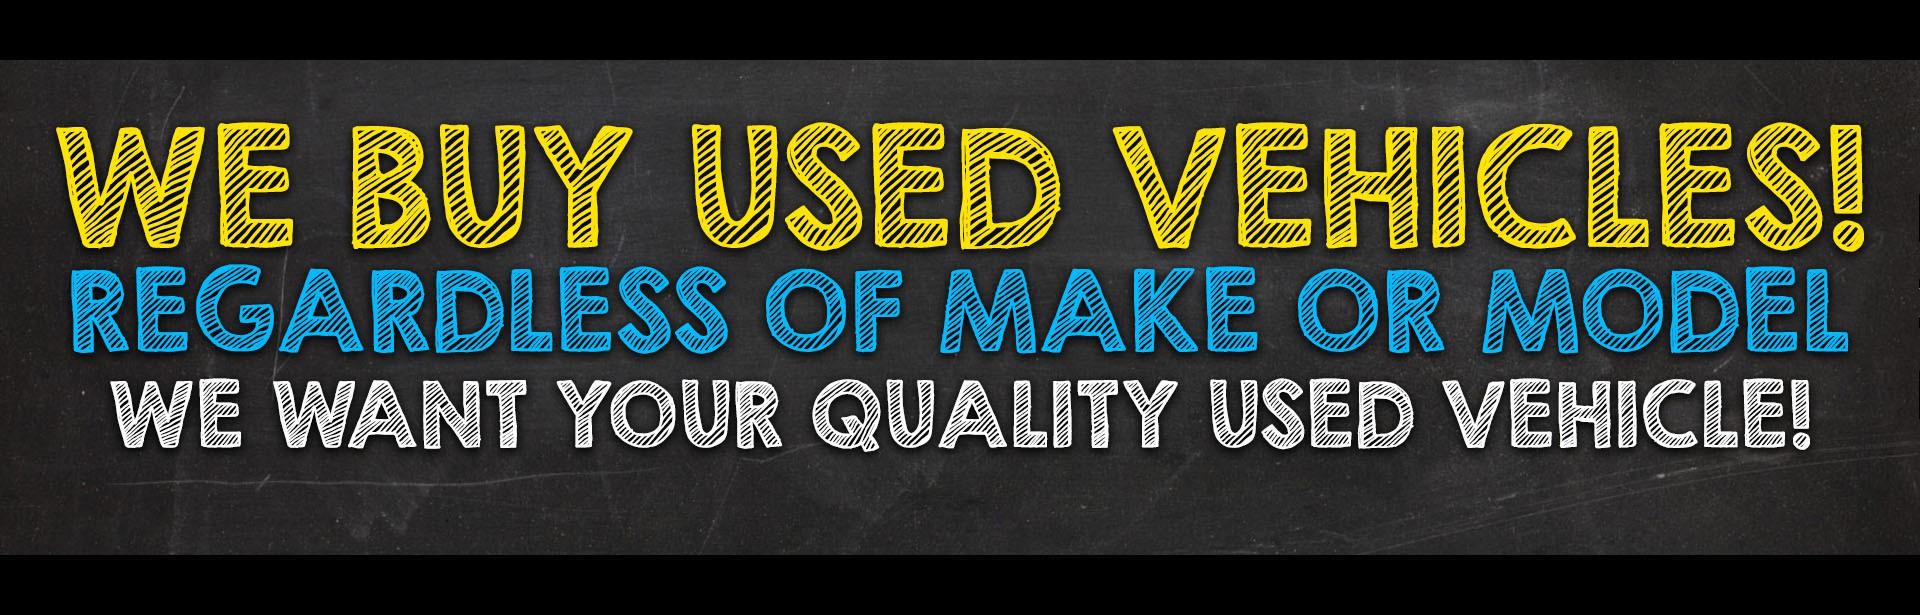 We buy used vehicles - September 2017 - Chalk